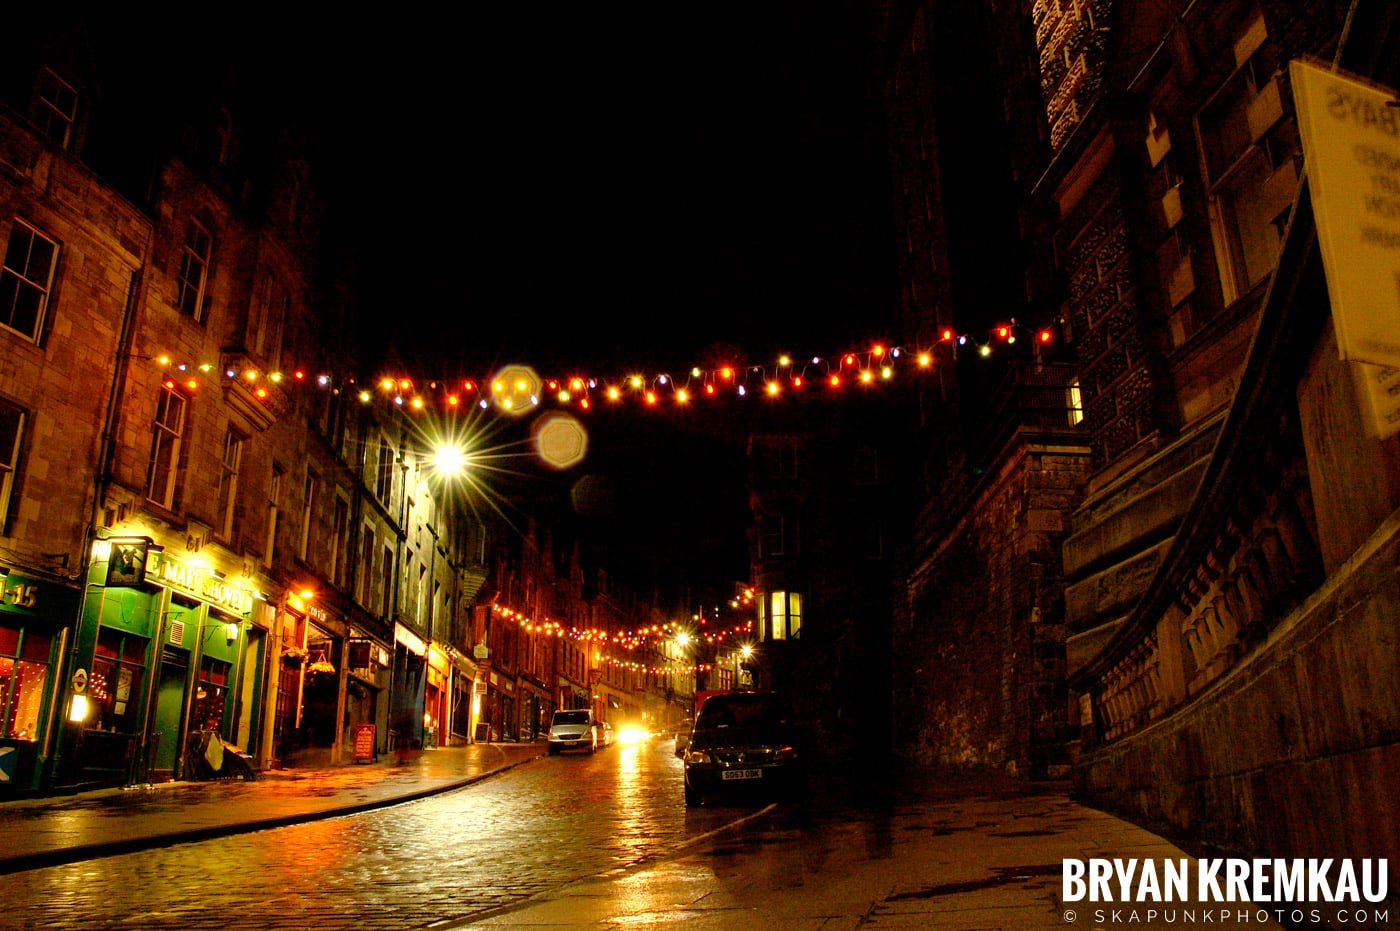 Edinburgh, Scotland - Day 1 - 12.12.06 (4)